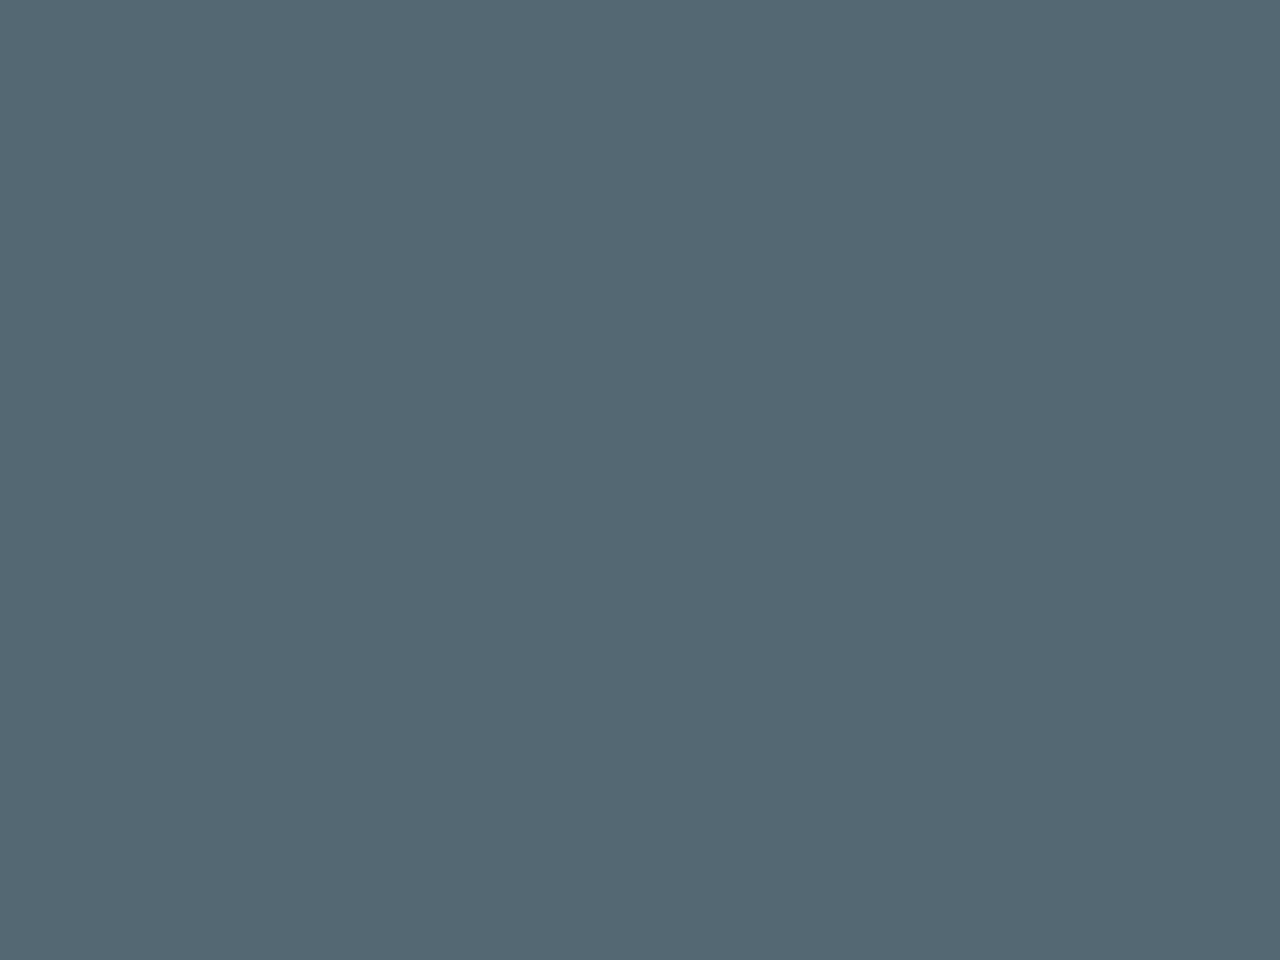 1280x960 Cadet Solid Color Background